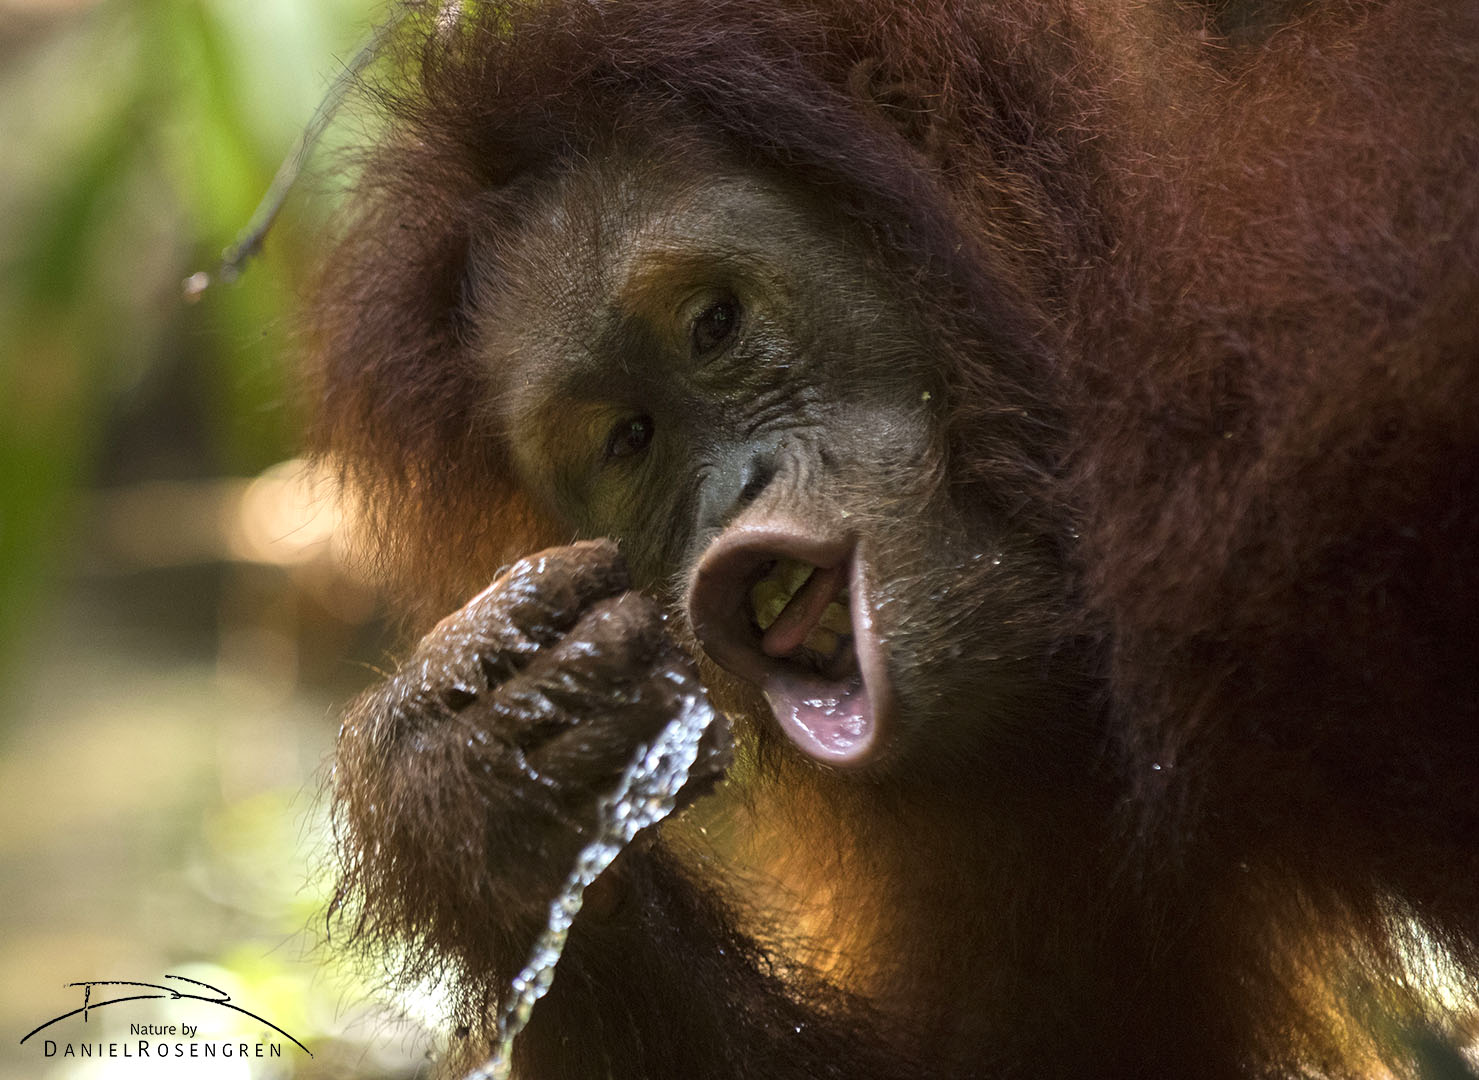 A young Orang-utans drinking water. © Daniel Rosengren